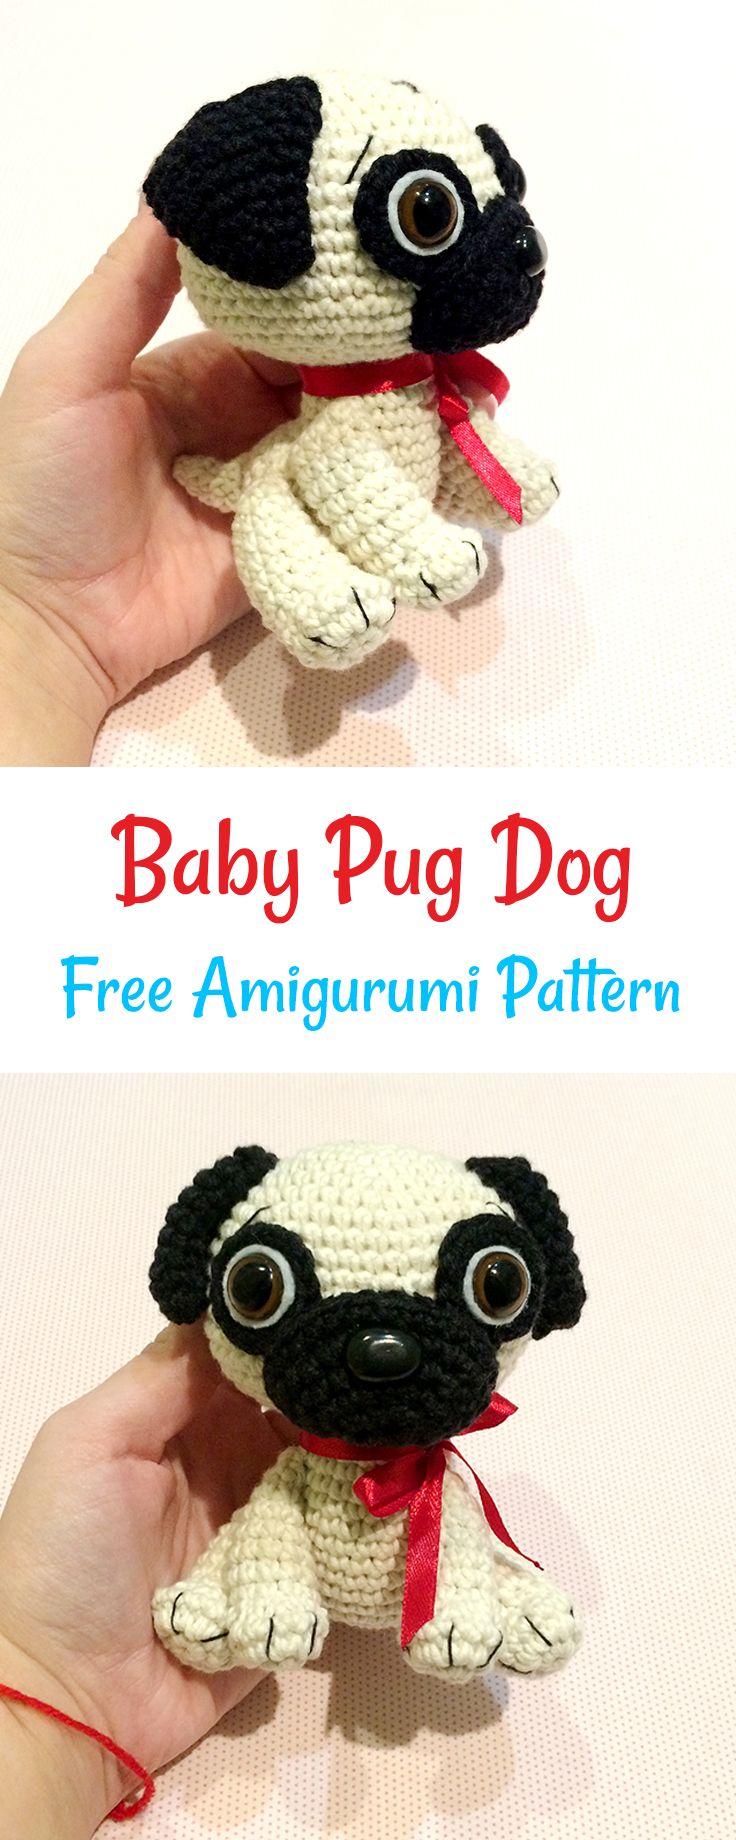 Sleepy chicken amigurumi pattern | Oyuncak | Pinterest | Tejido ...